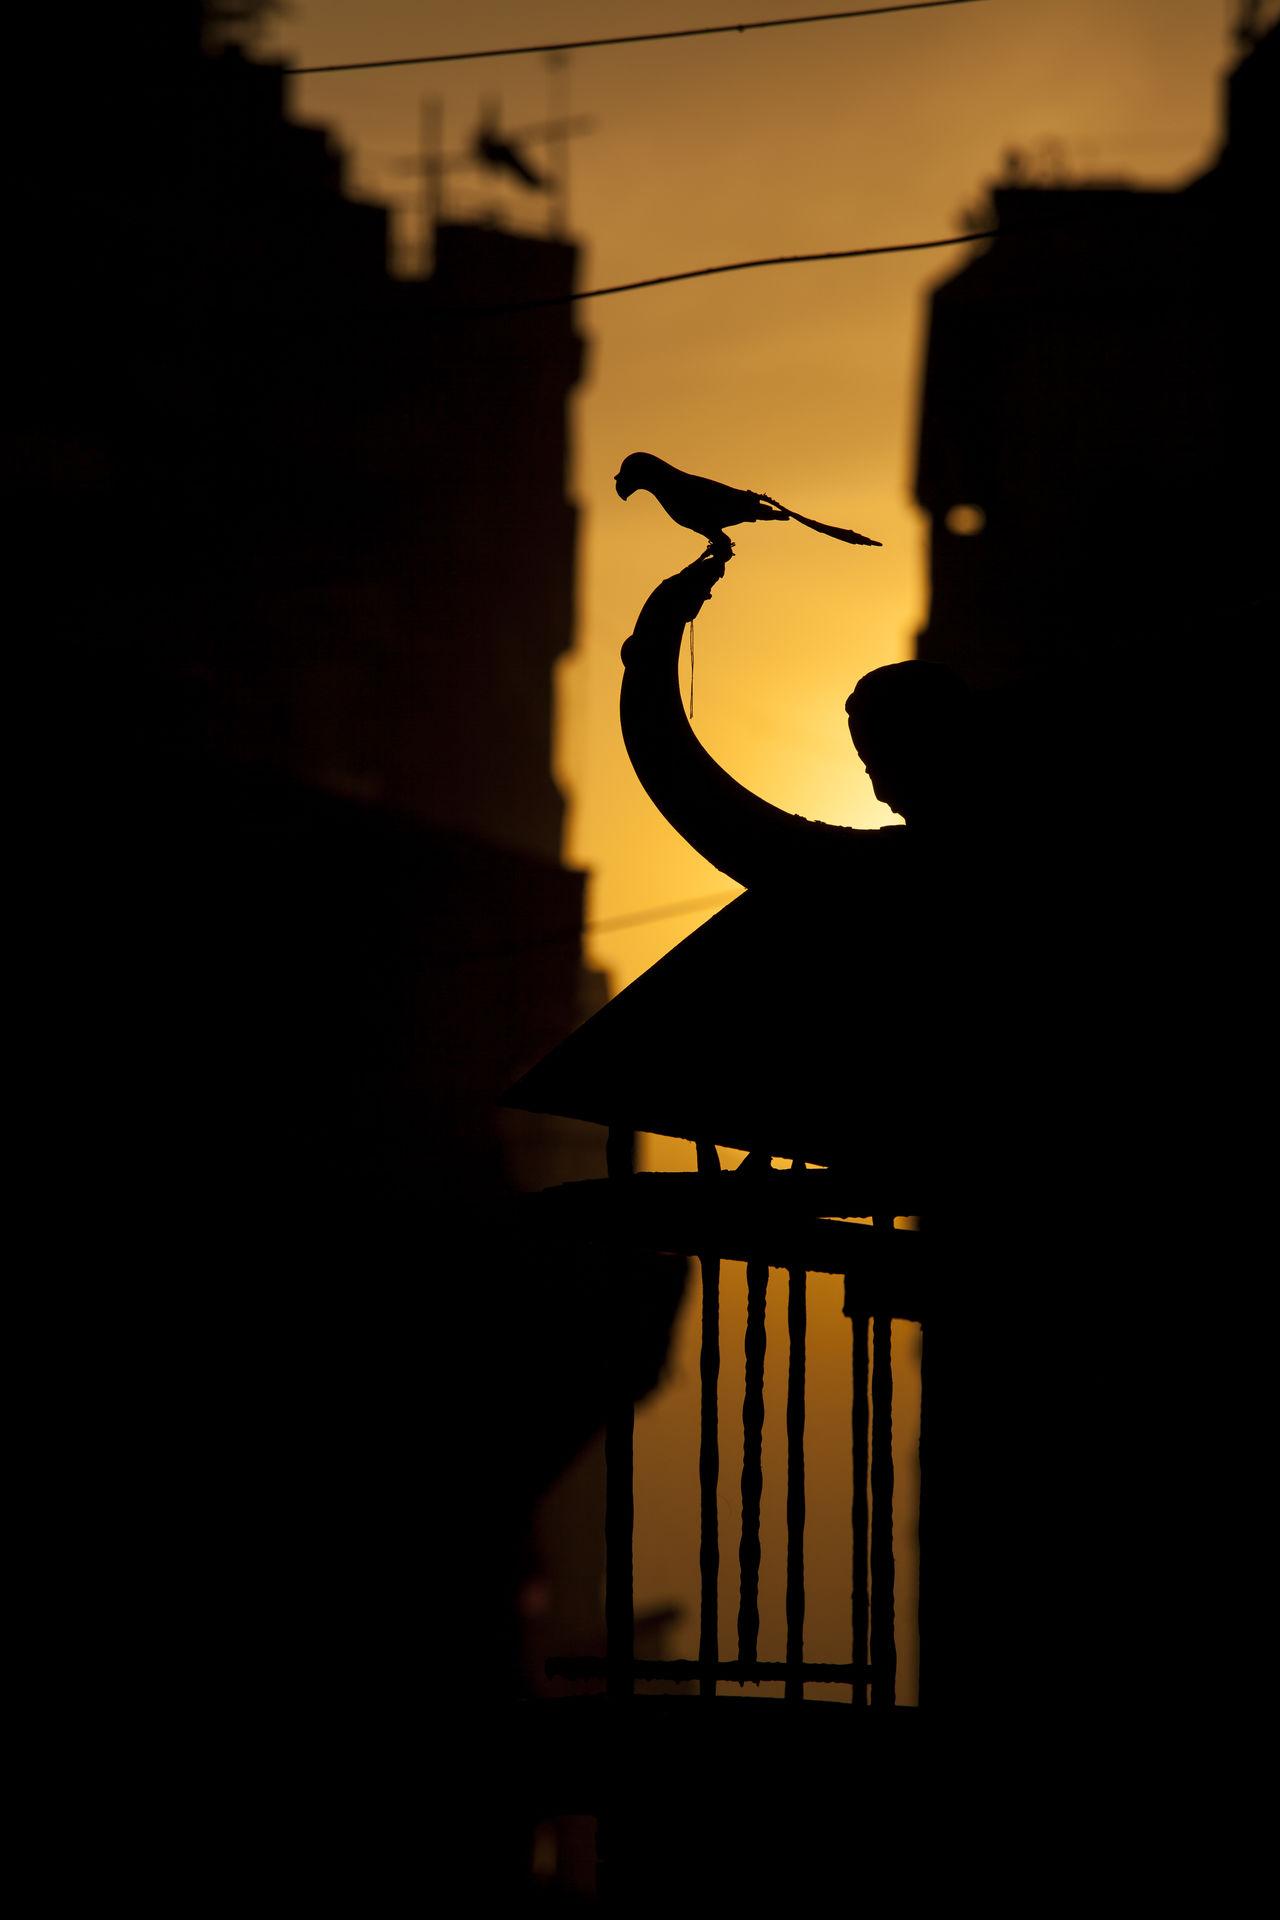 Silhouette of bird sculpture of a Hindu temple at Kathmandu, Nepal during evening. Animal Architecture Art Backlight Bird Evening Evening Light Kathmandu Nepal Sculpture Silhouette Sky Sunset Wanderlust Warm